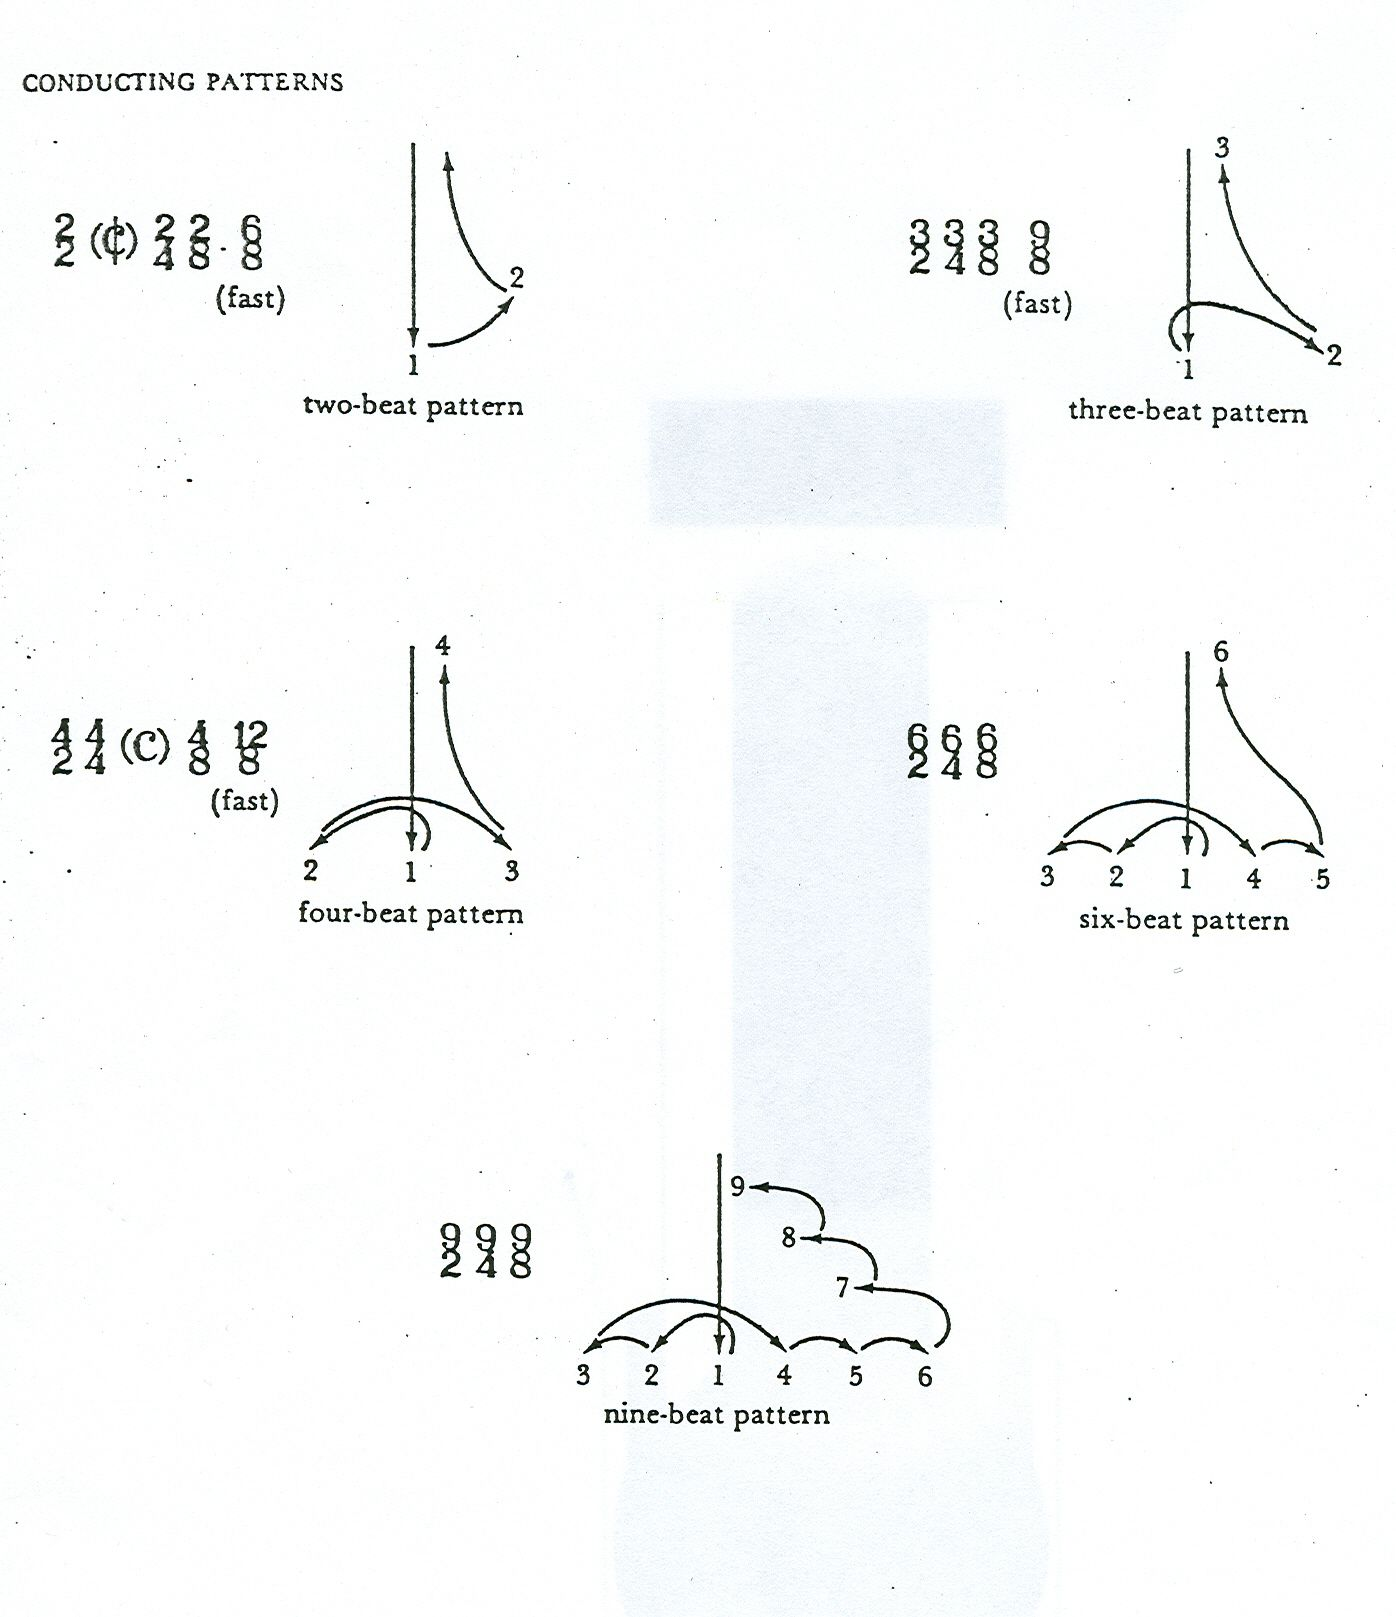 drum major conducting patterns pdf